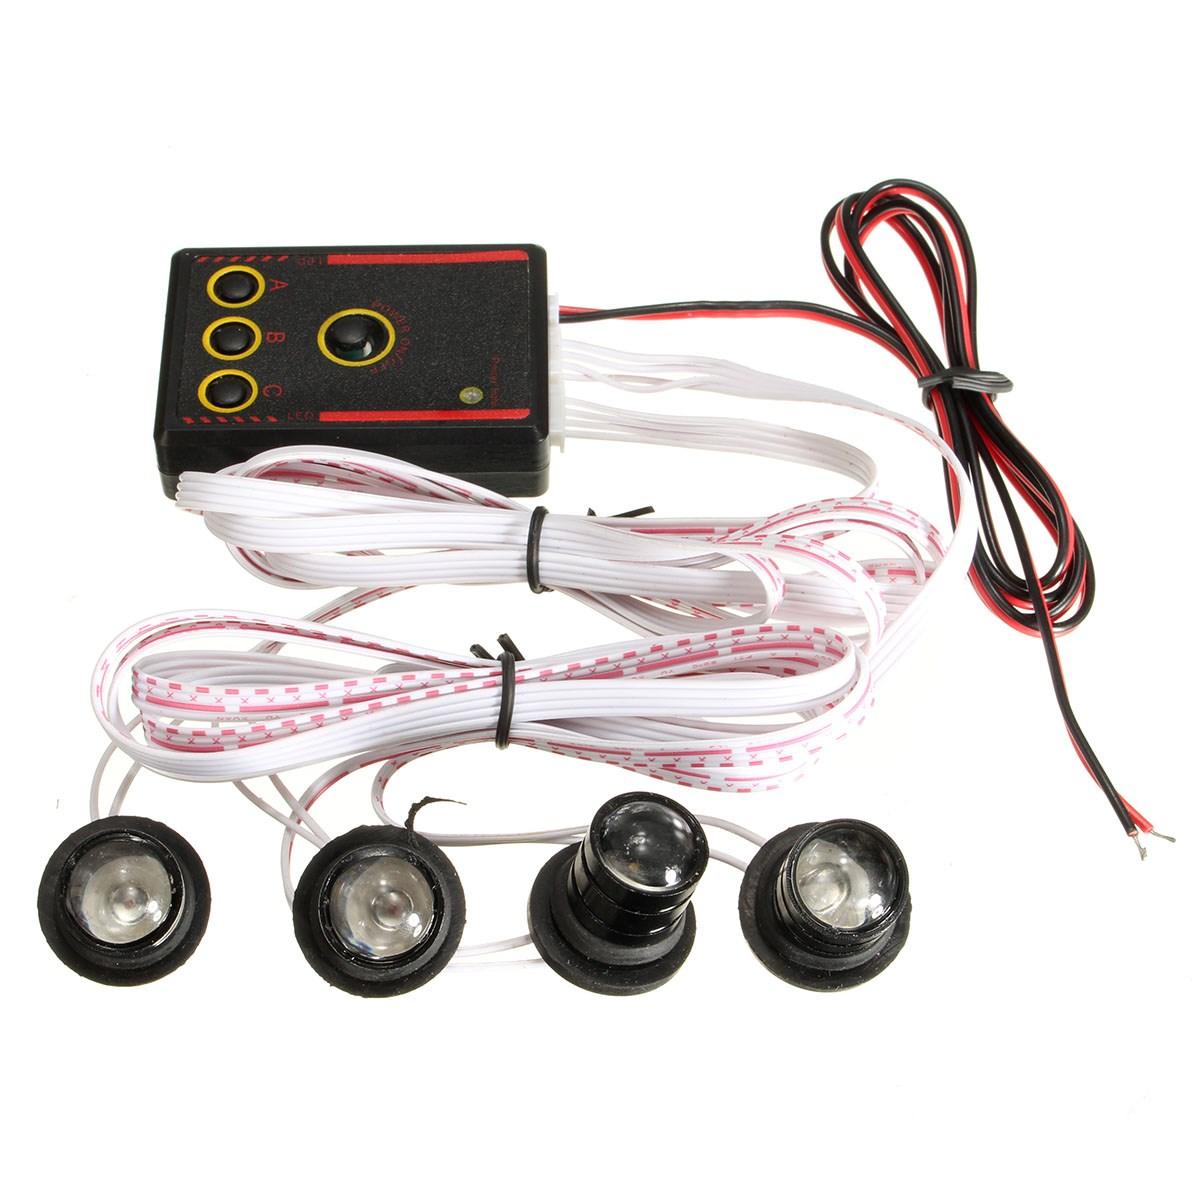 New Car Styling 4 Bulbs Led Flash Strobe Light Flashing lights for Cars Day Light Brake Reverse Lamp(China (Mainland))